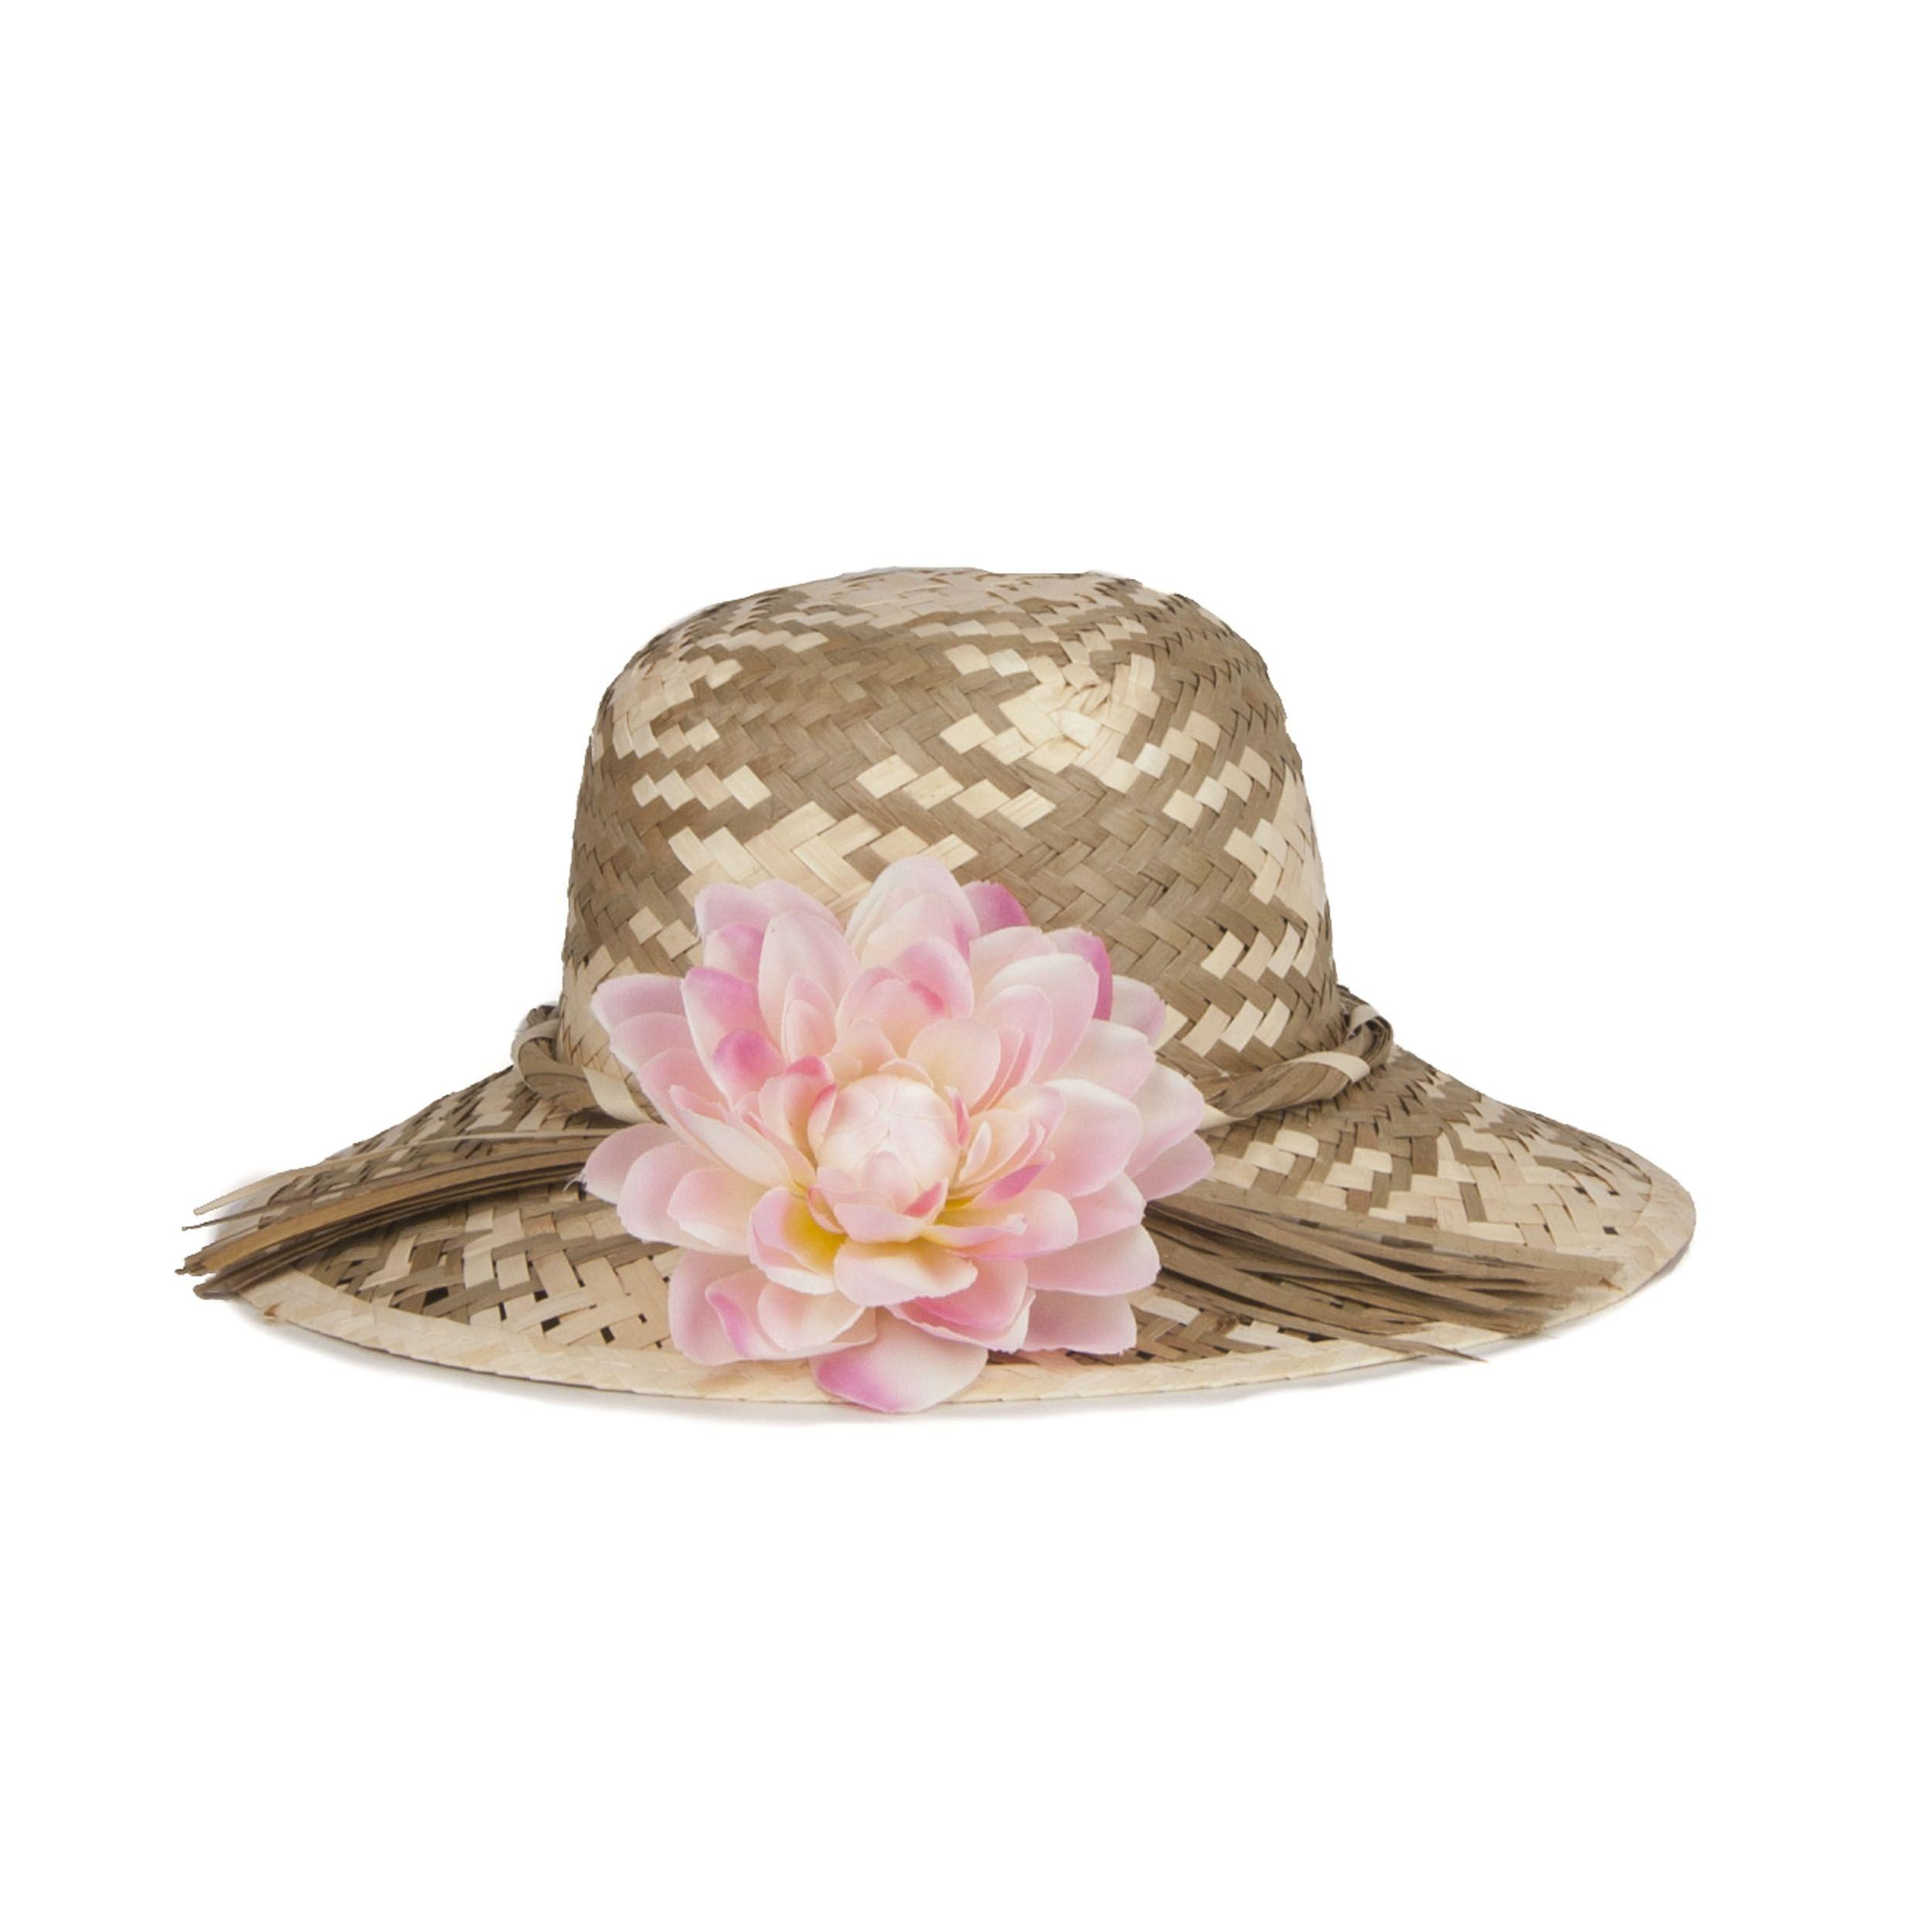 Maria Graor Artisanal Hat in Beige